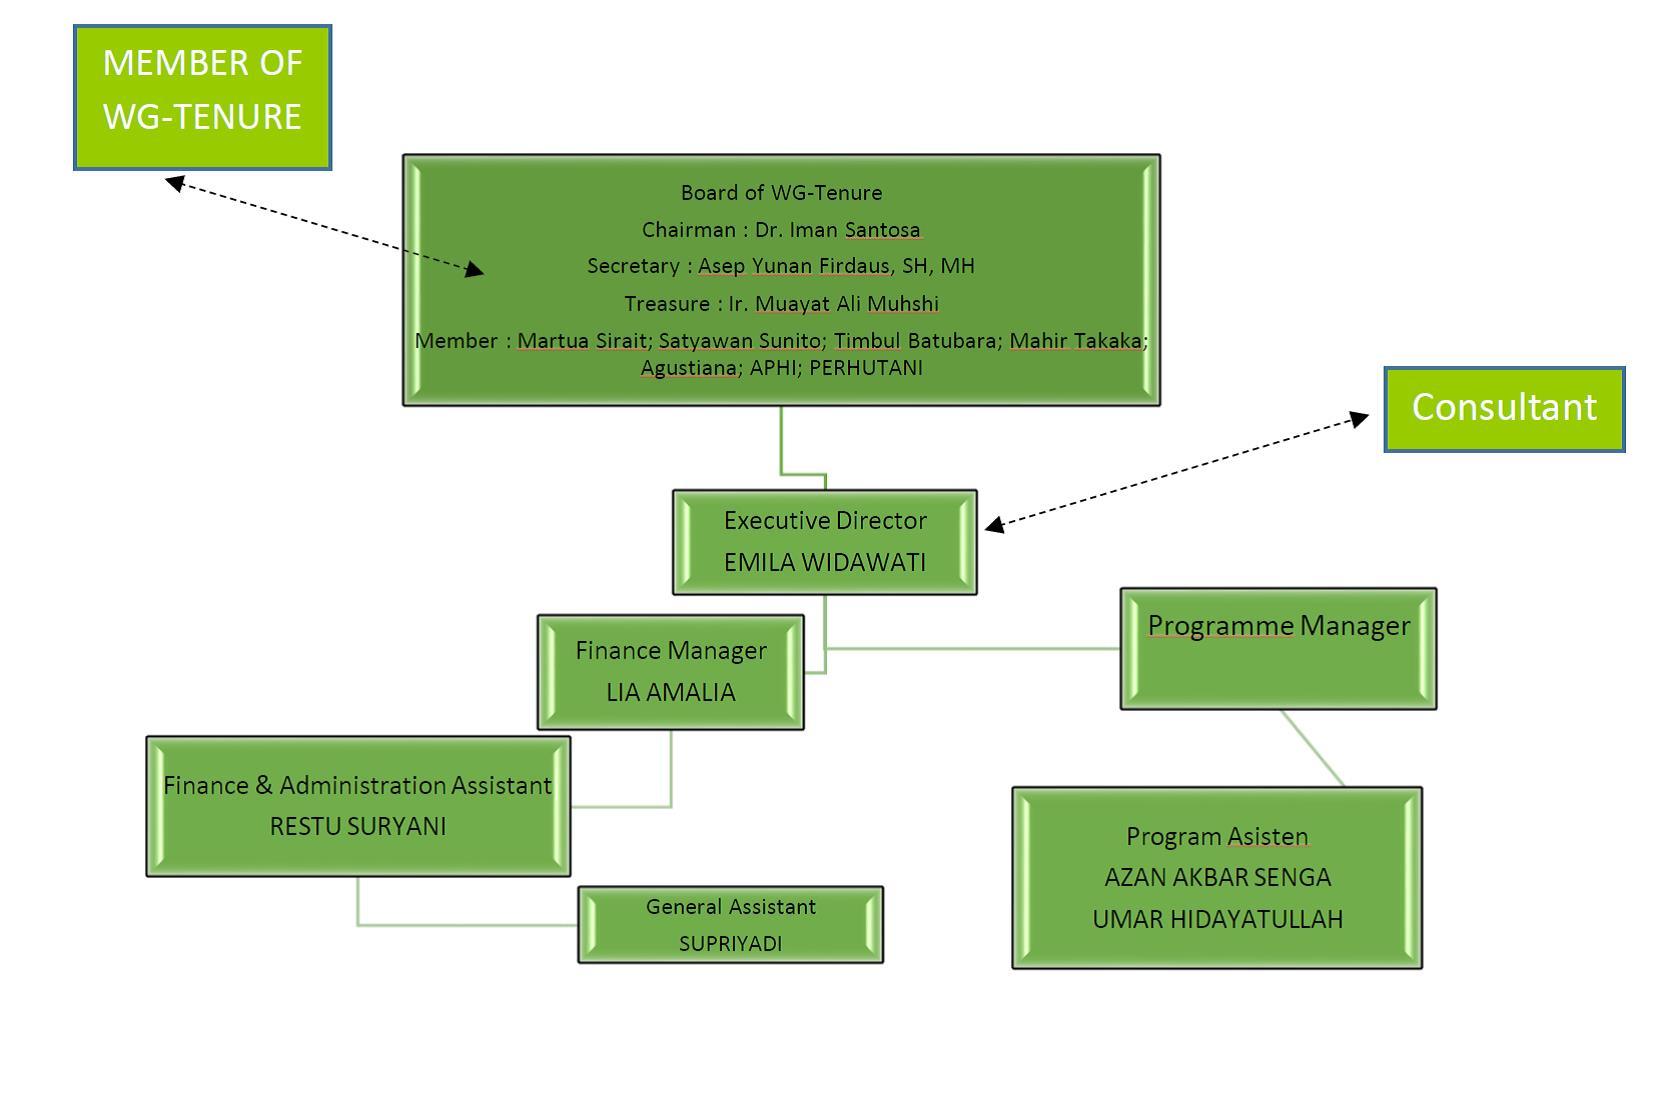 struktur Badan Organisasi WG Tenure_new